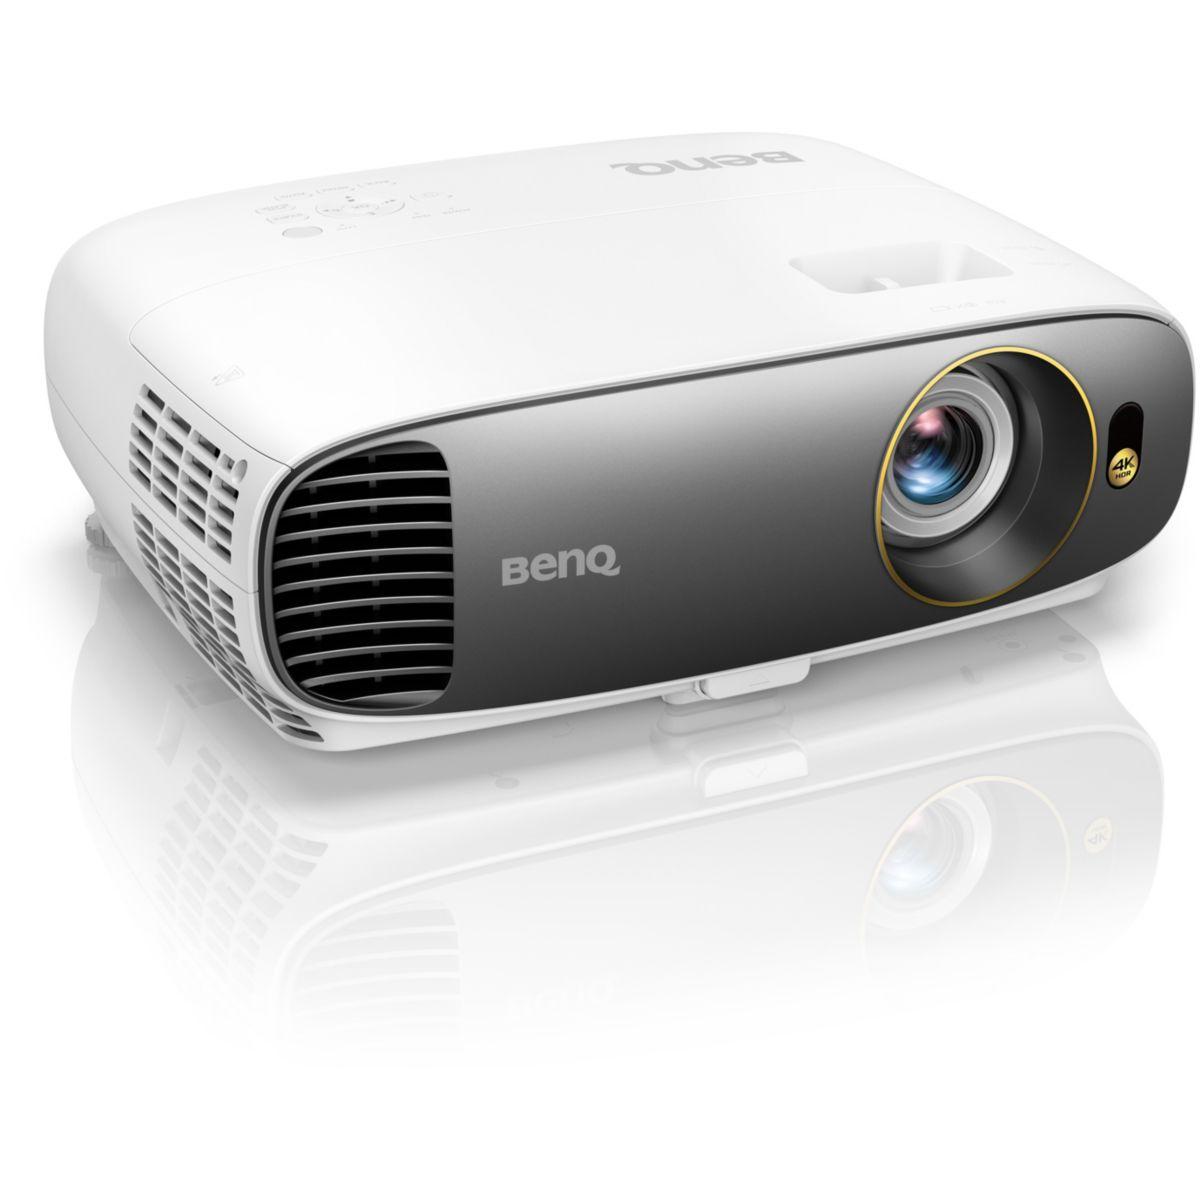 Vidéoprojecteur home cinéma BENQ W1700 4K UHD